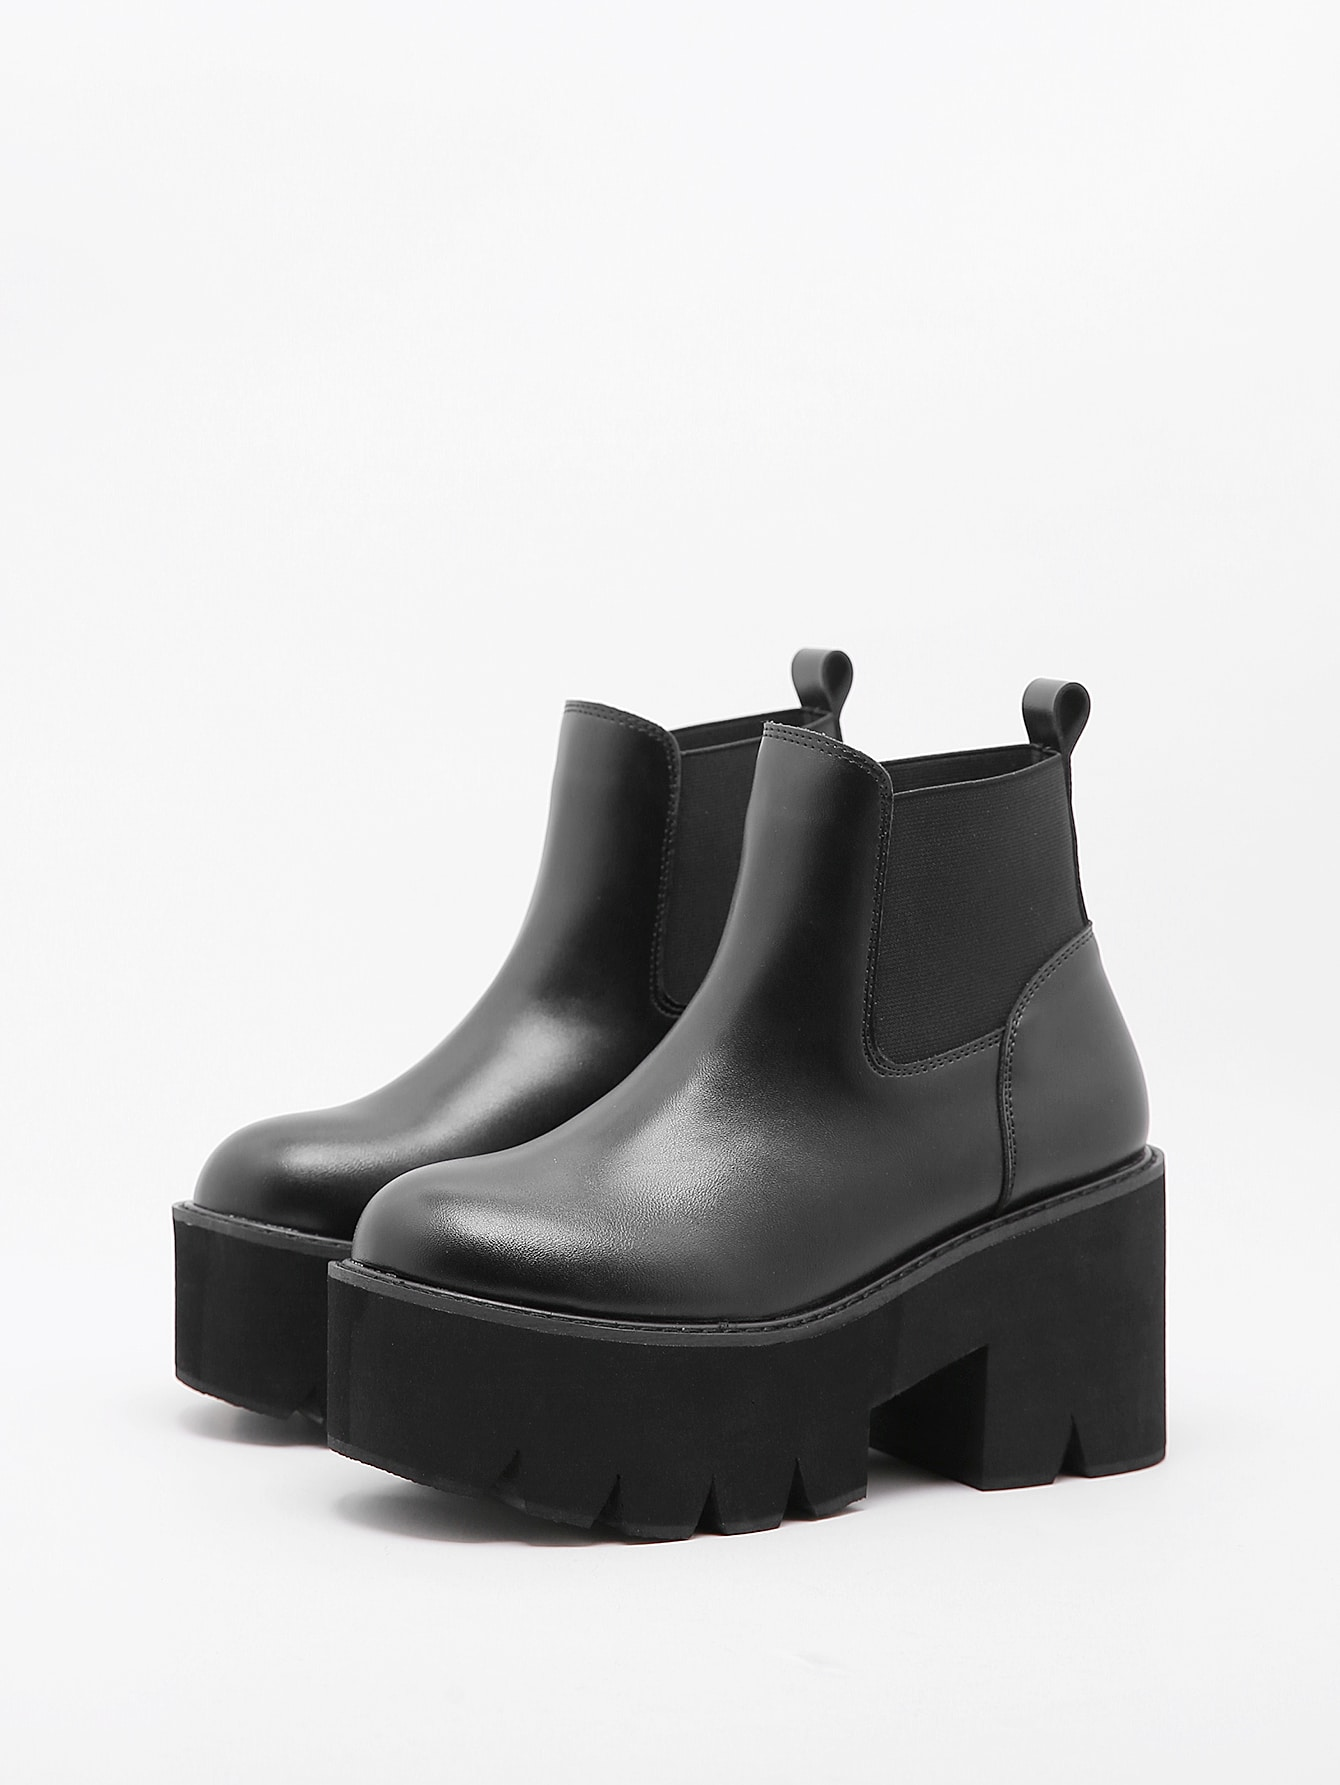 Minimalist Platform Chunky Heeled Chelsea Boots